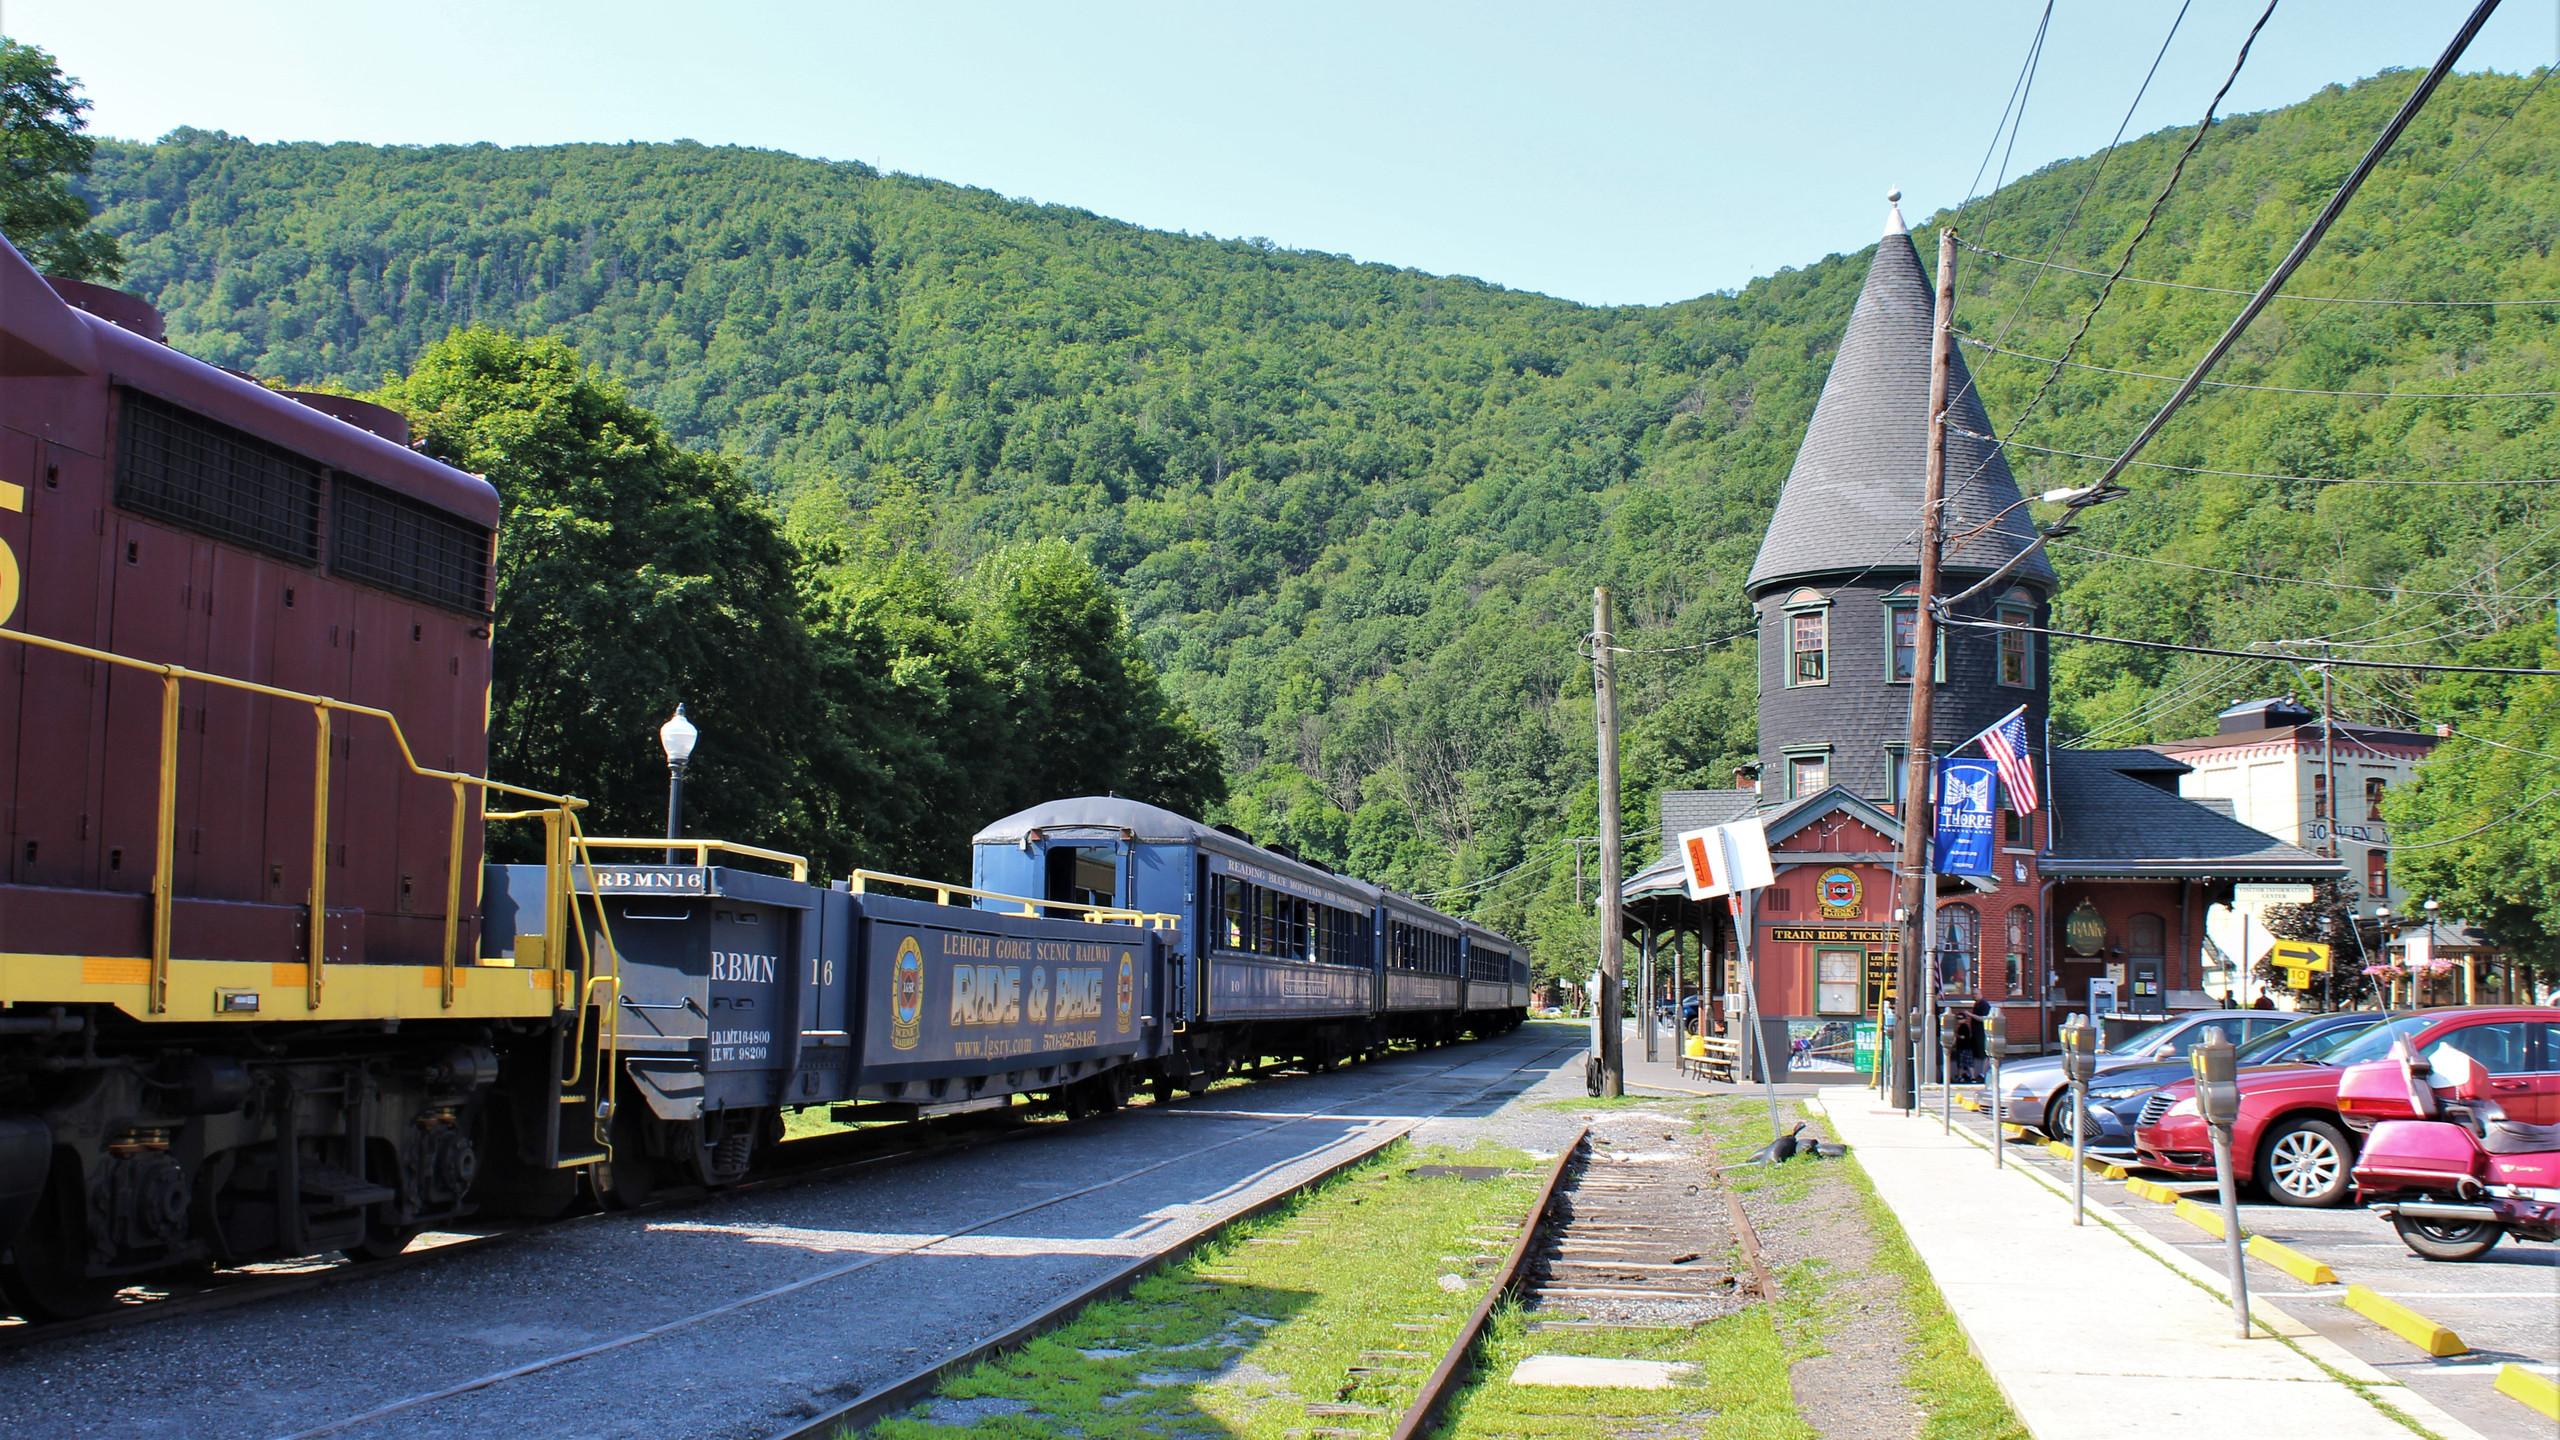 Lehigh Gorge Scenic Railroad